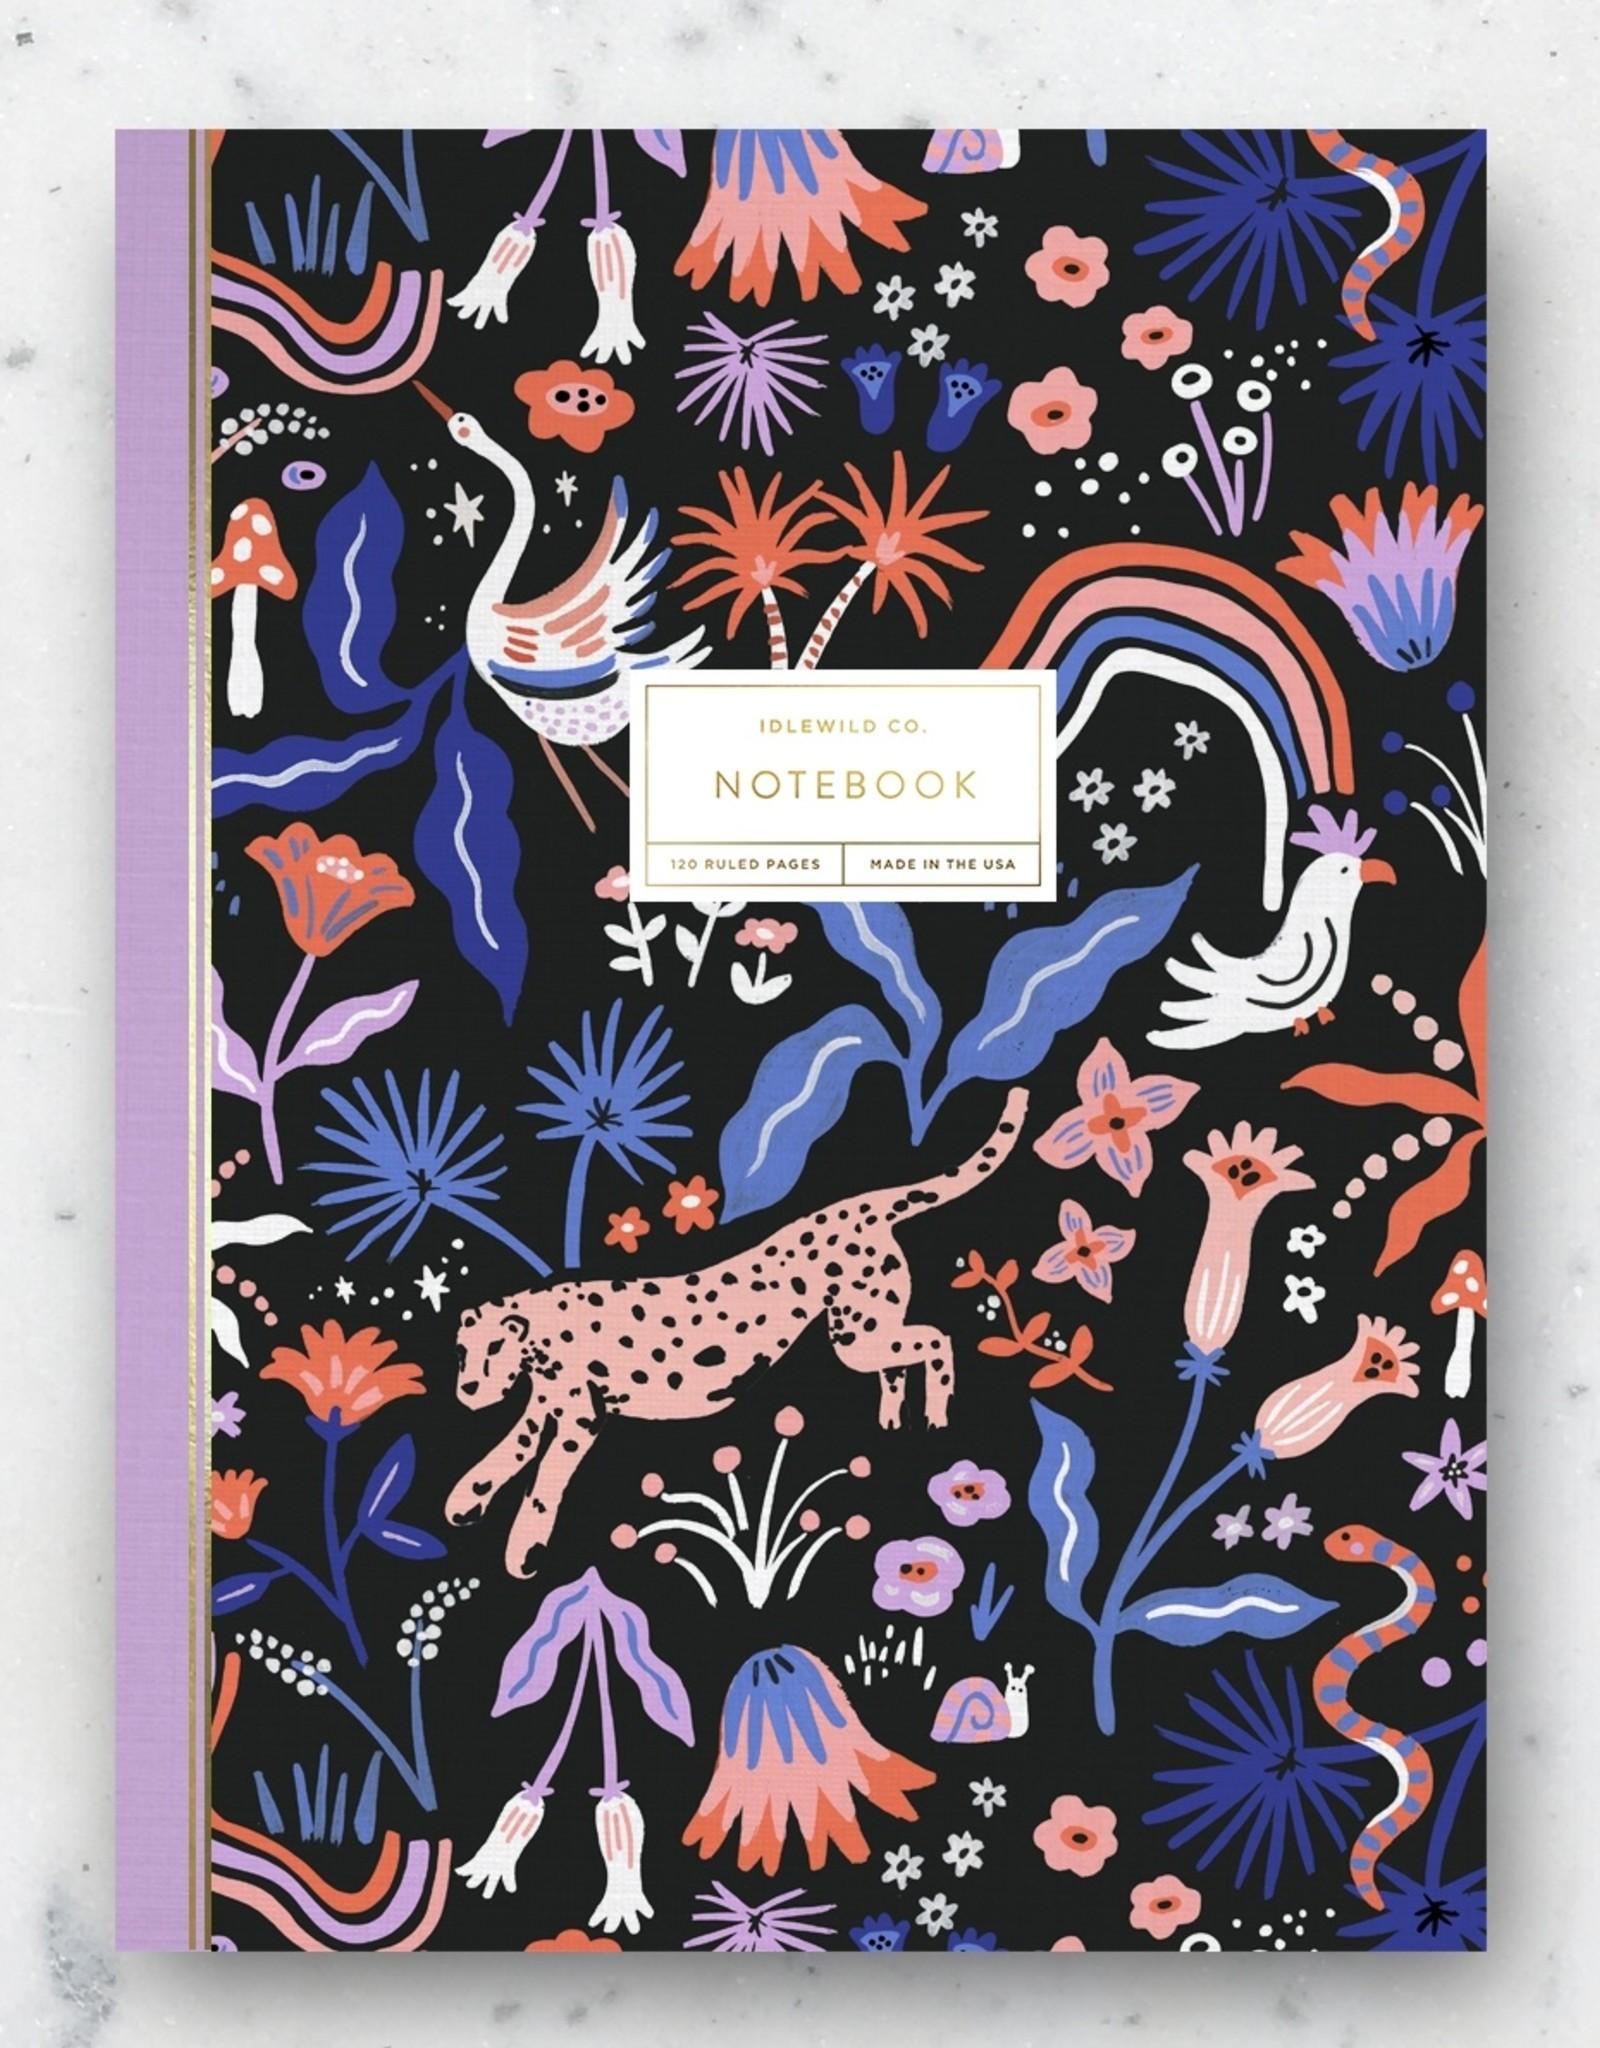 Idlewild Co. Notebook: Midnight Menagerie